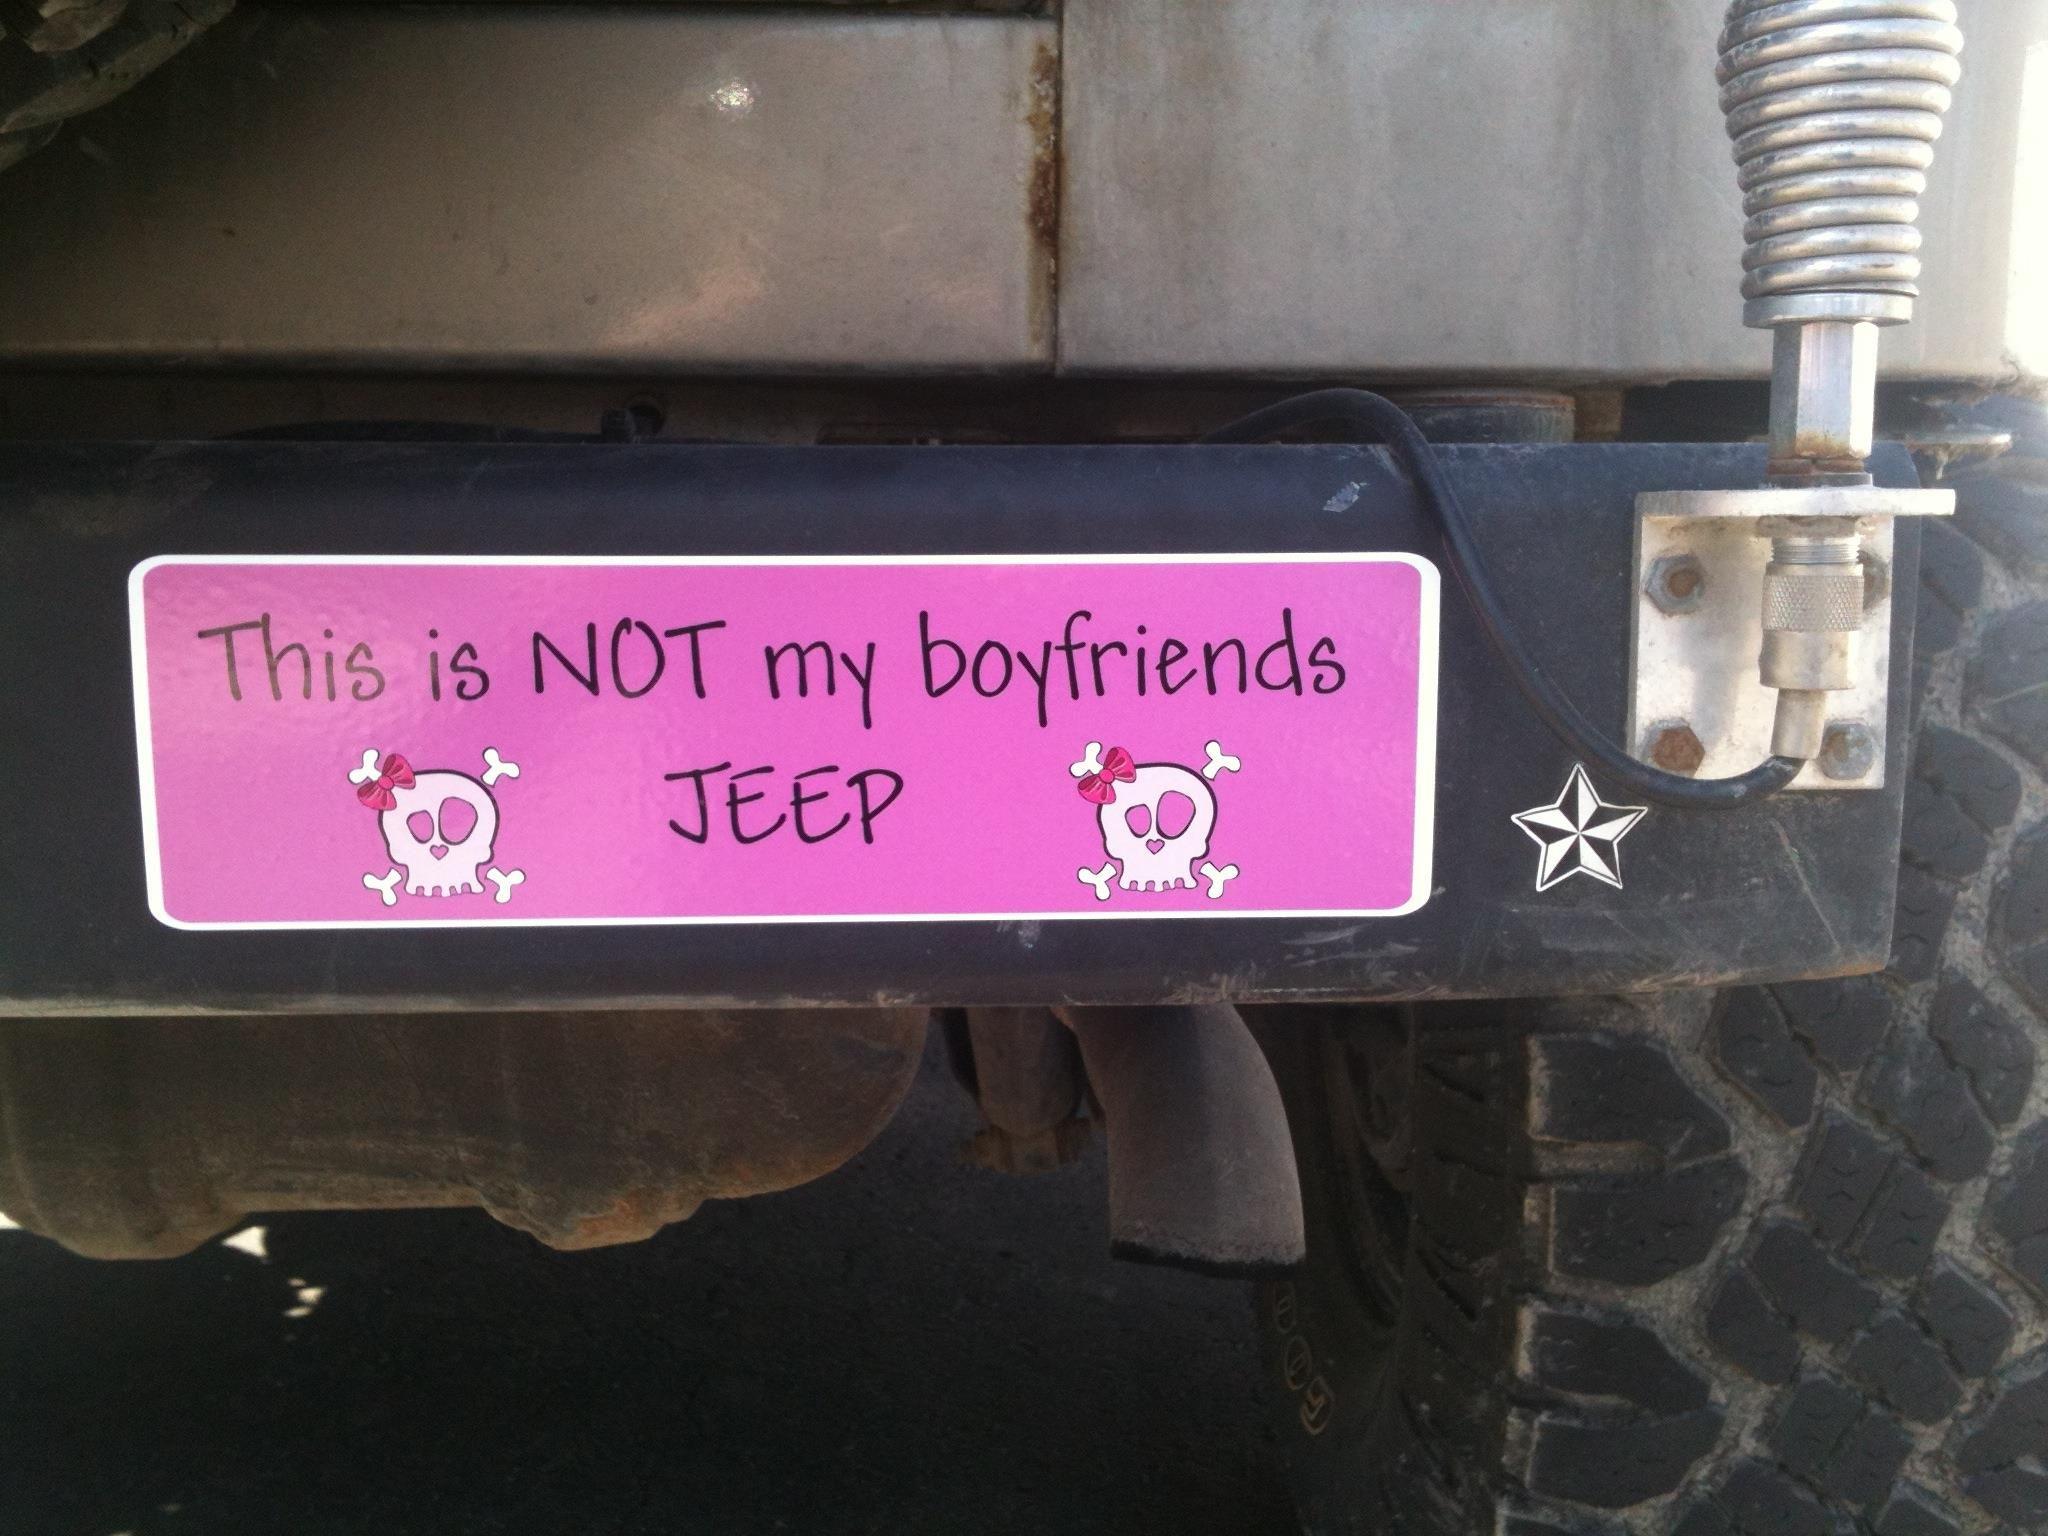 Jeep Bumper Sticker - This is NOT my boyfriend's Jeep